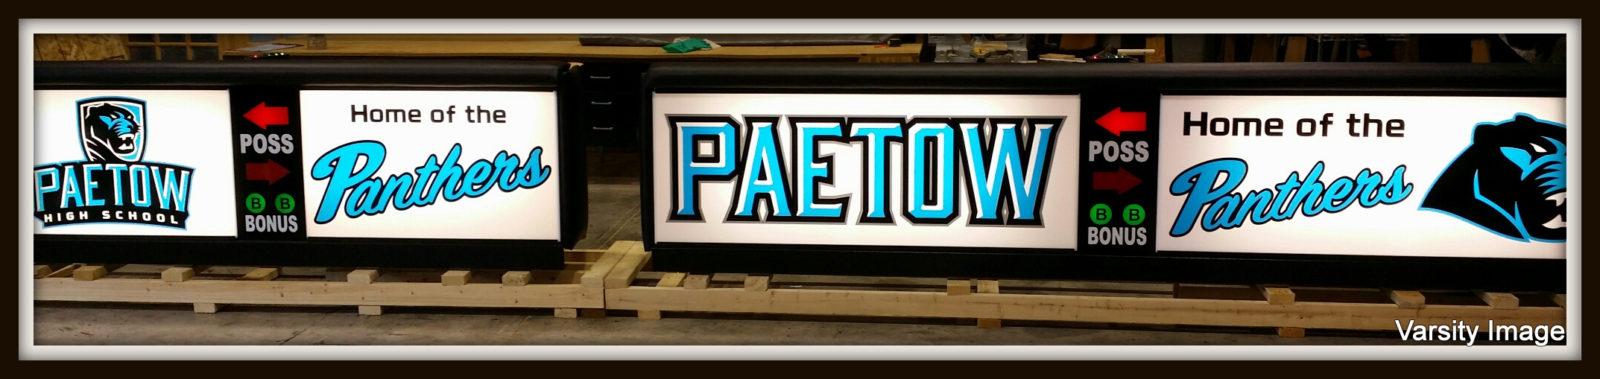 Paetow High School Freestand Scoring Table